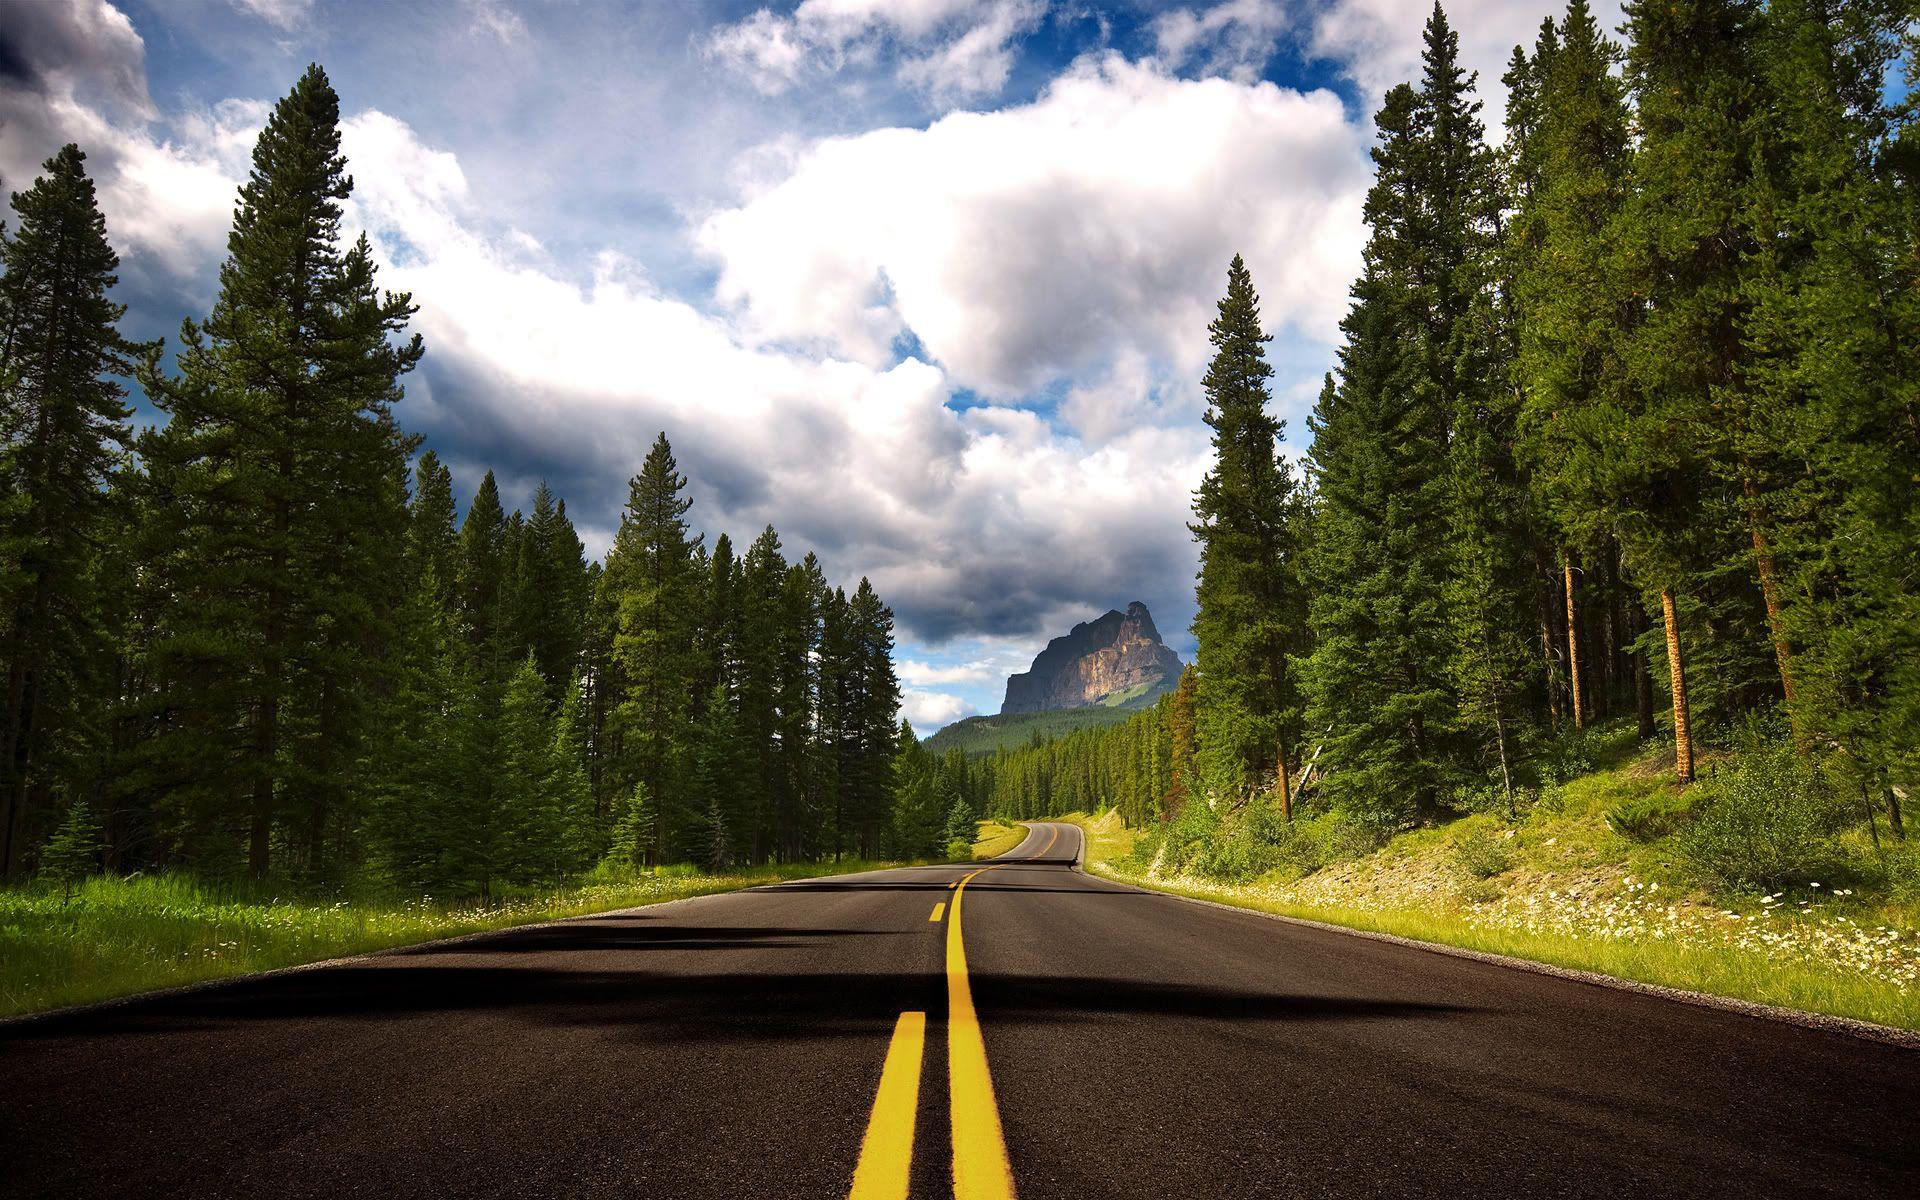 Ahhhh The Open Road Thats Where I Wanna Be Right